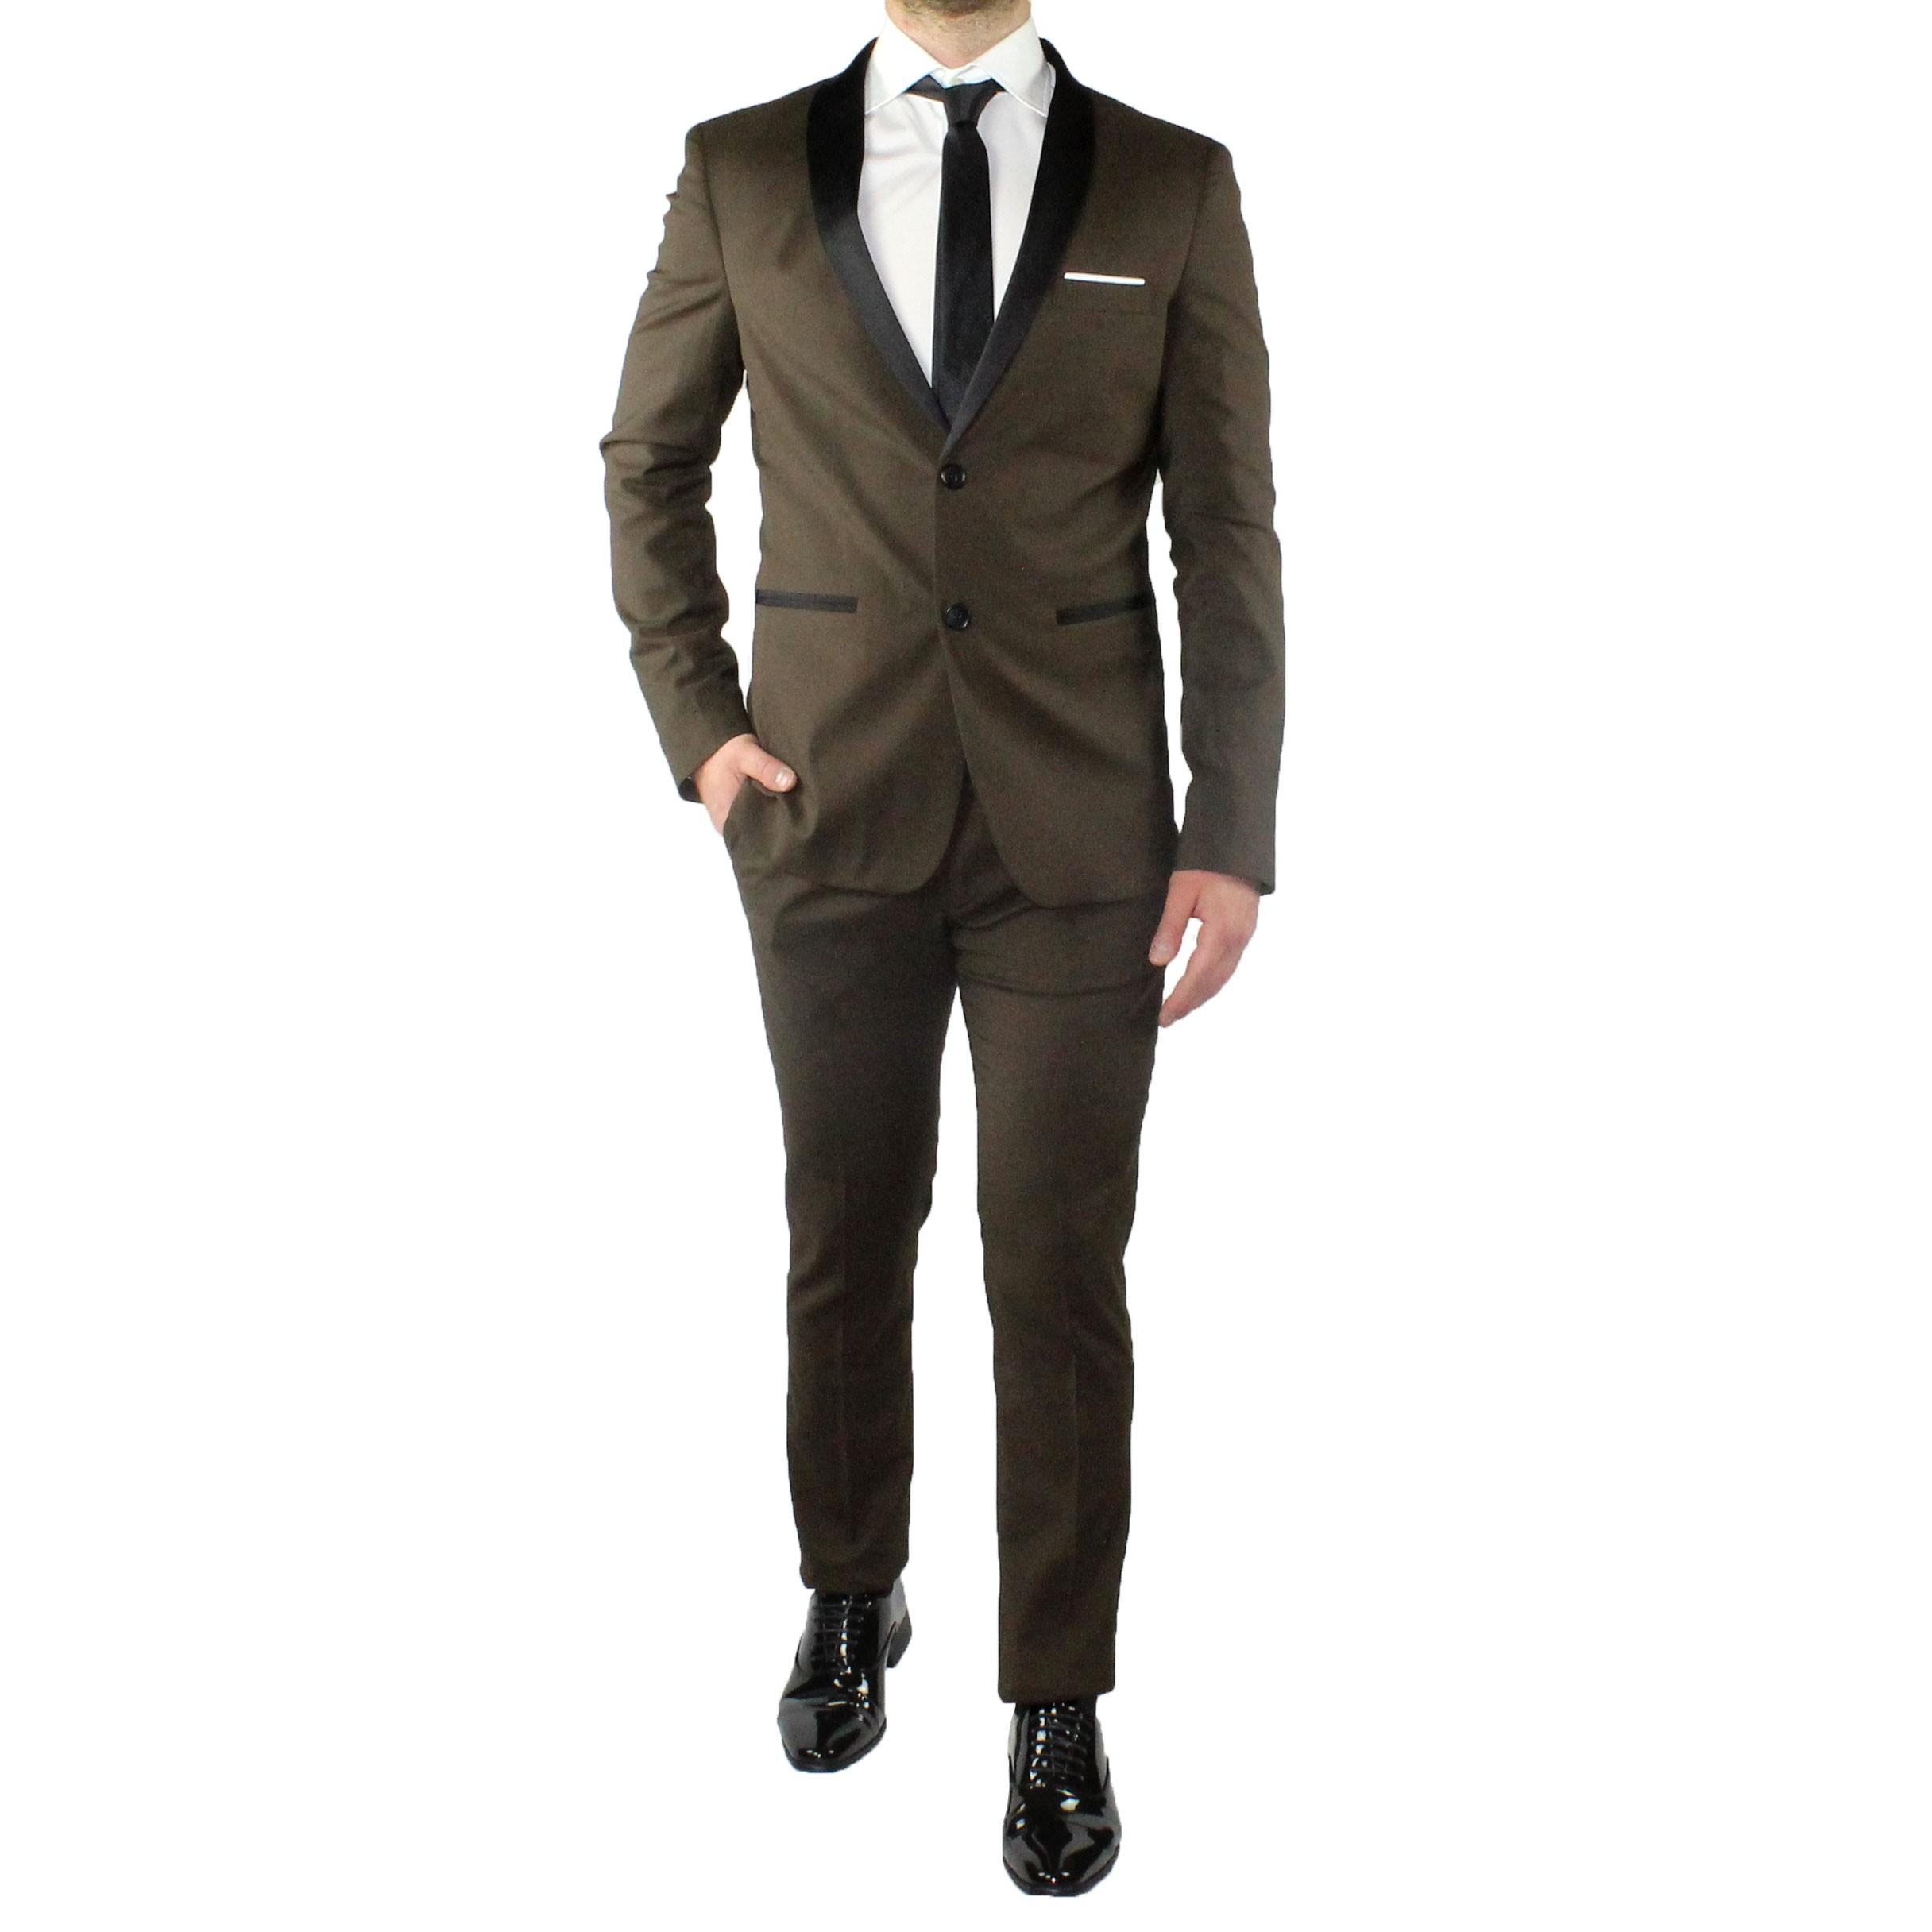 Abito-Uomo-Smoking-Elegante-Vestito-Completo-Estivo-Cerimonia-Sartoriale-Slim miniatura 16